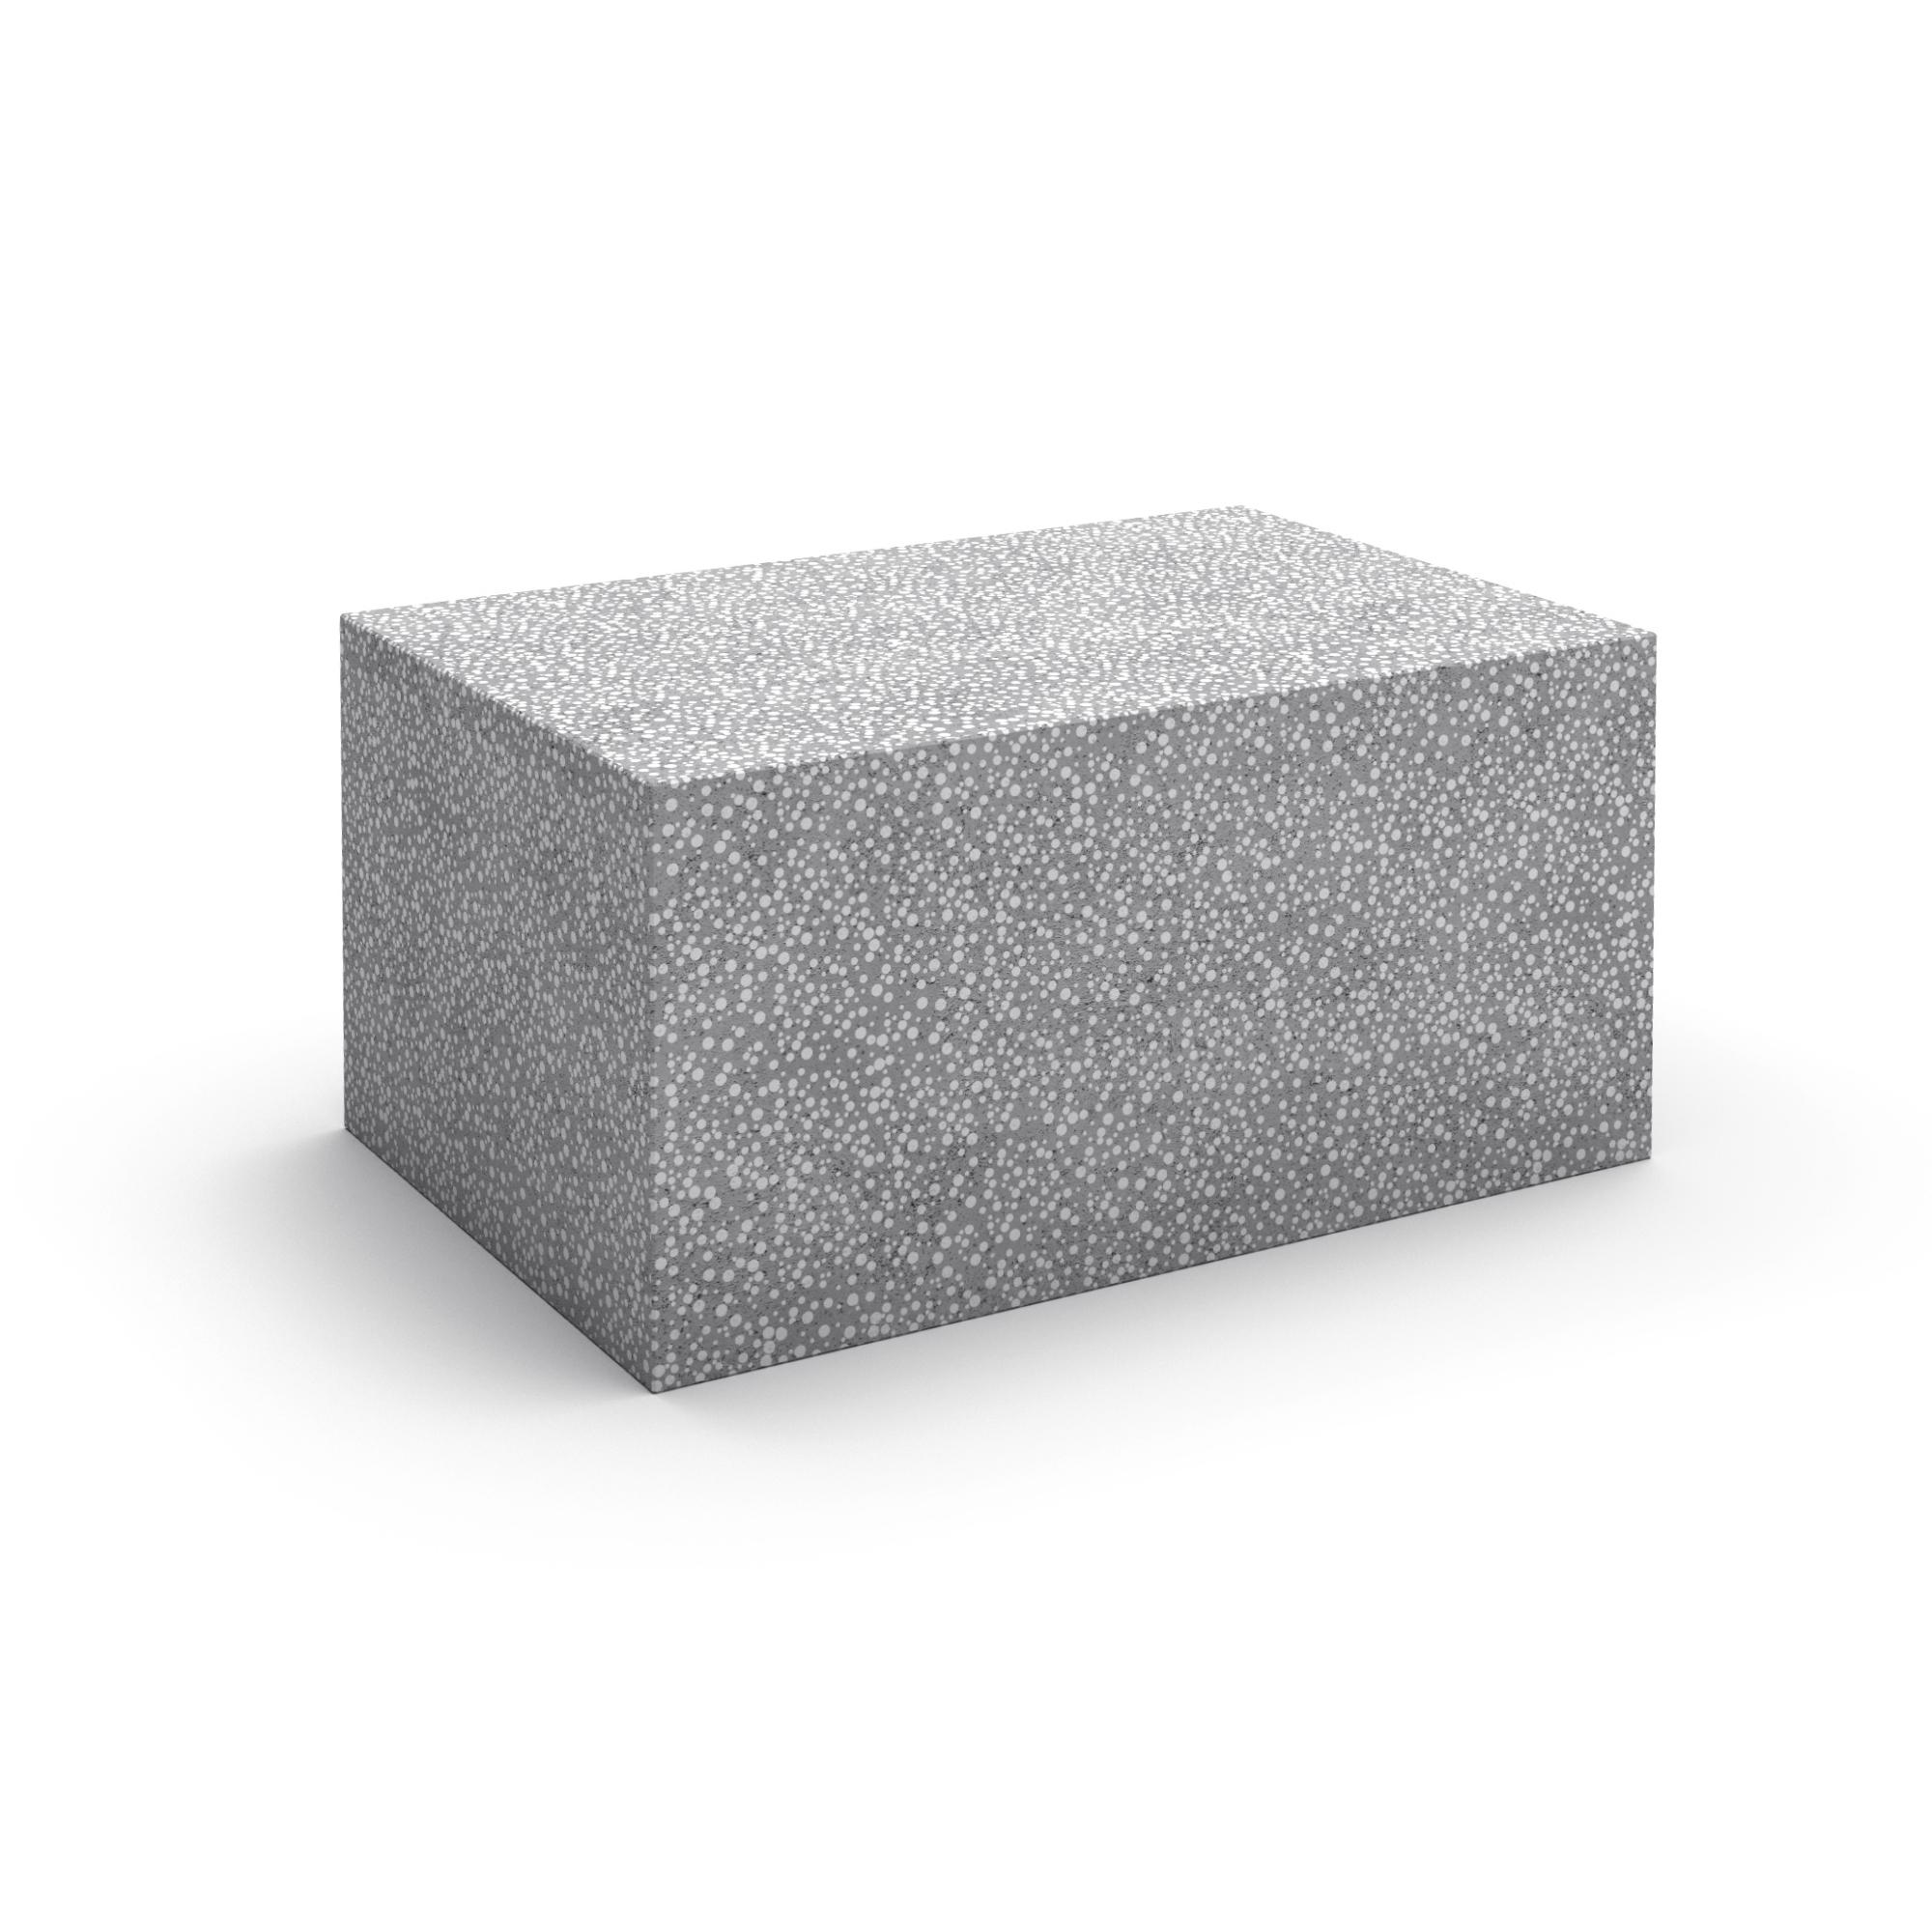 Куплю полистирол бетон доставка раствора бетона цена москва